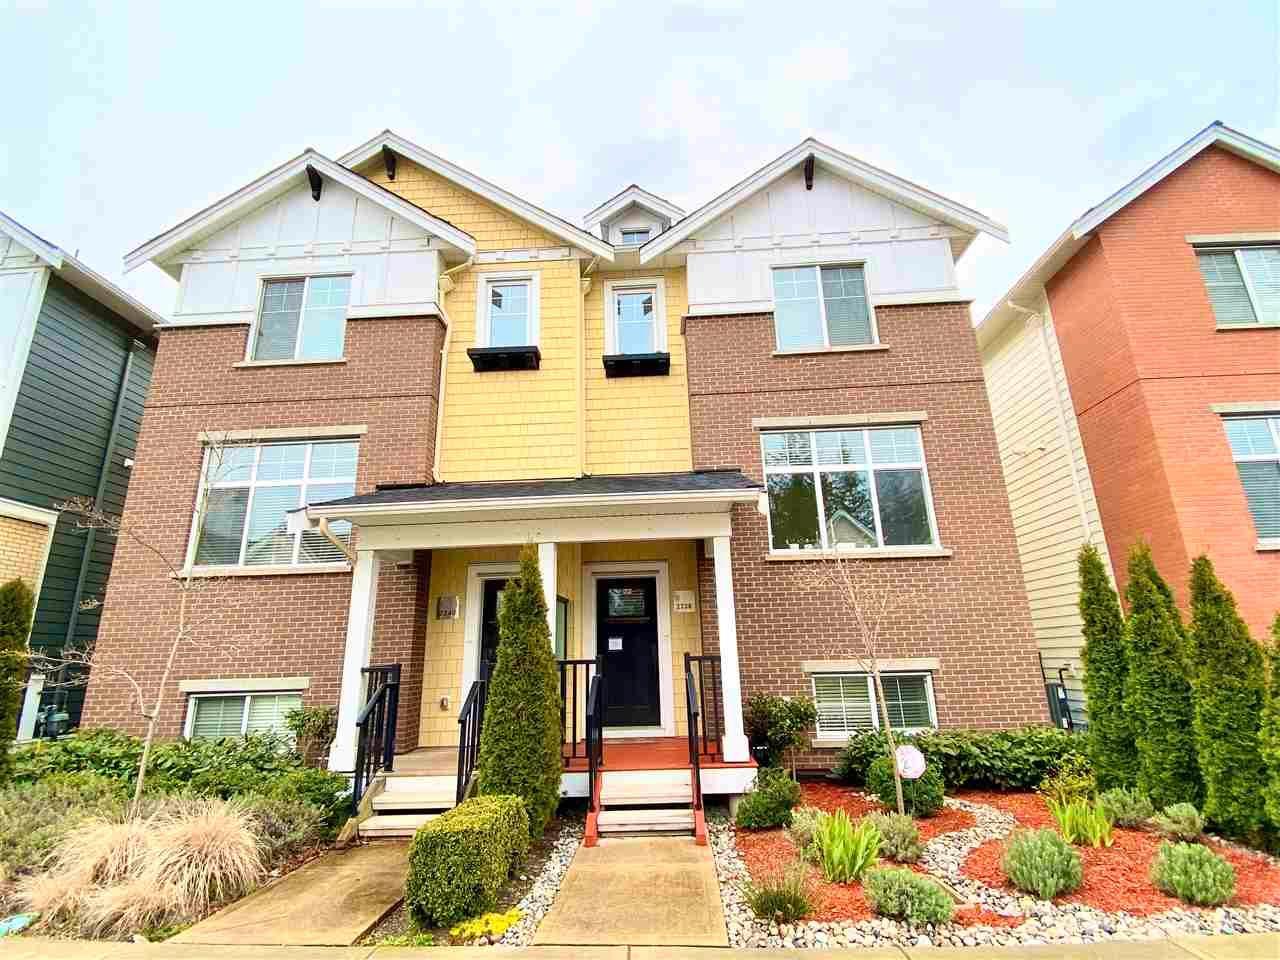 Main Photo: 2238 164A Street in Surrey: Grandview Surrey 1/2 Duplex for sale (South Surrey White Rock)  : MLS®# R2561189